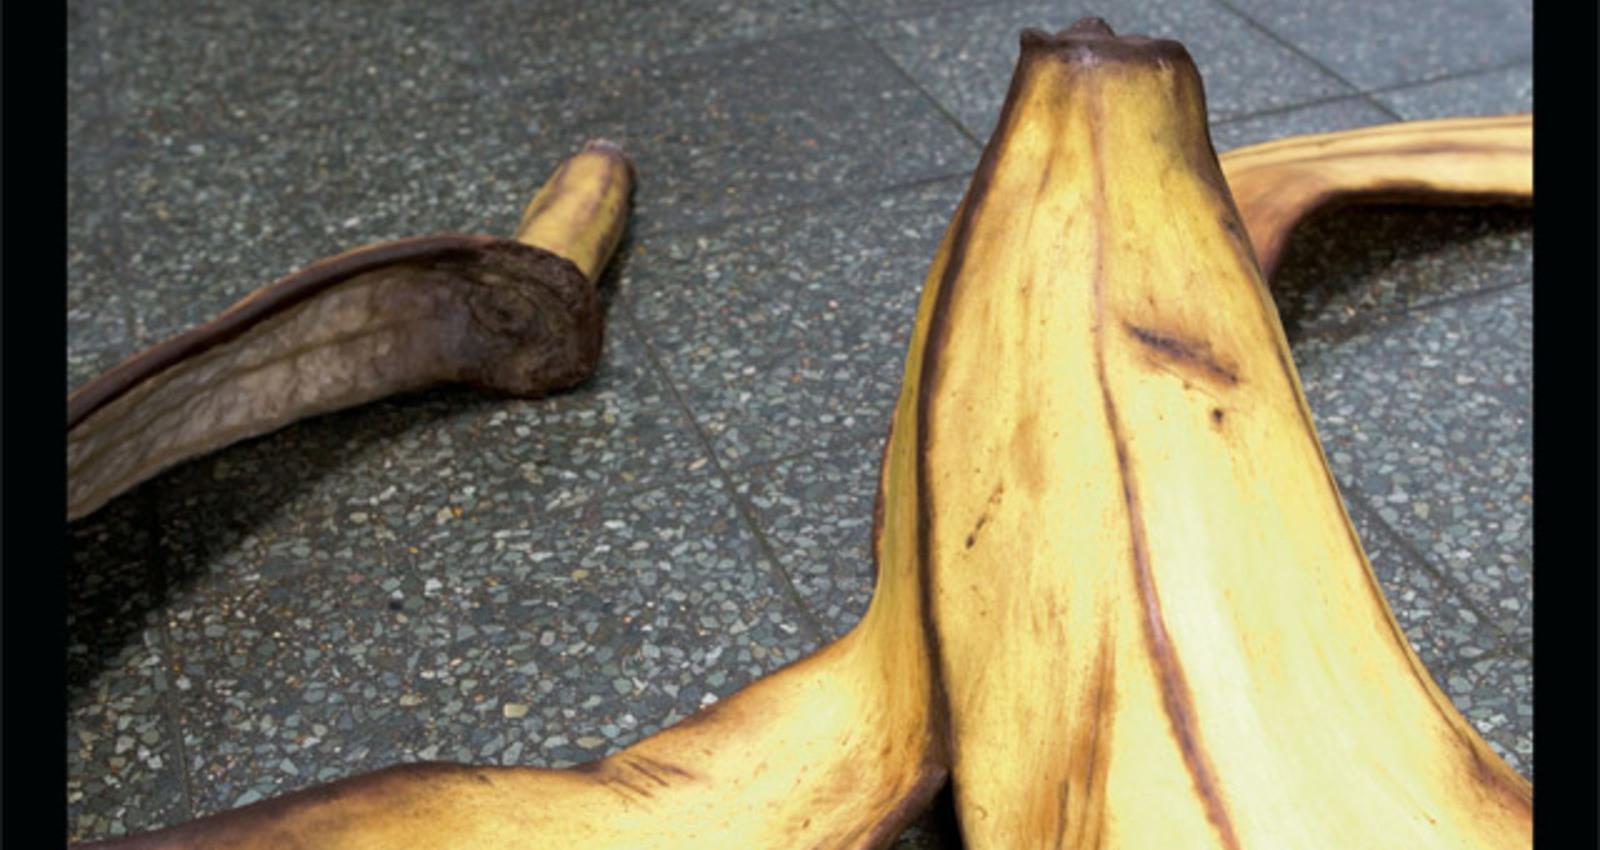 Huge Bananapeel